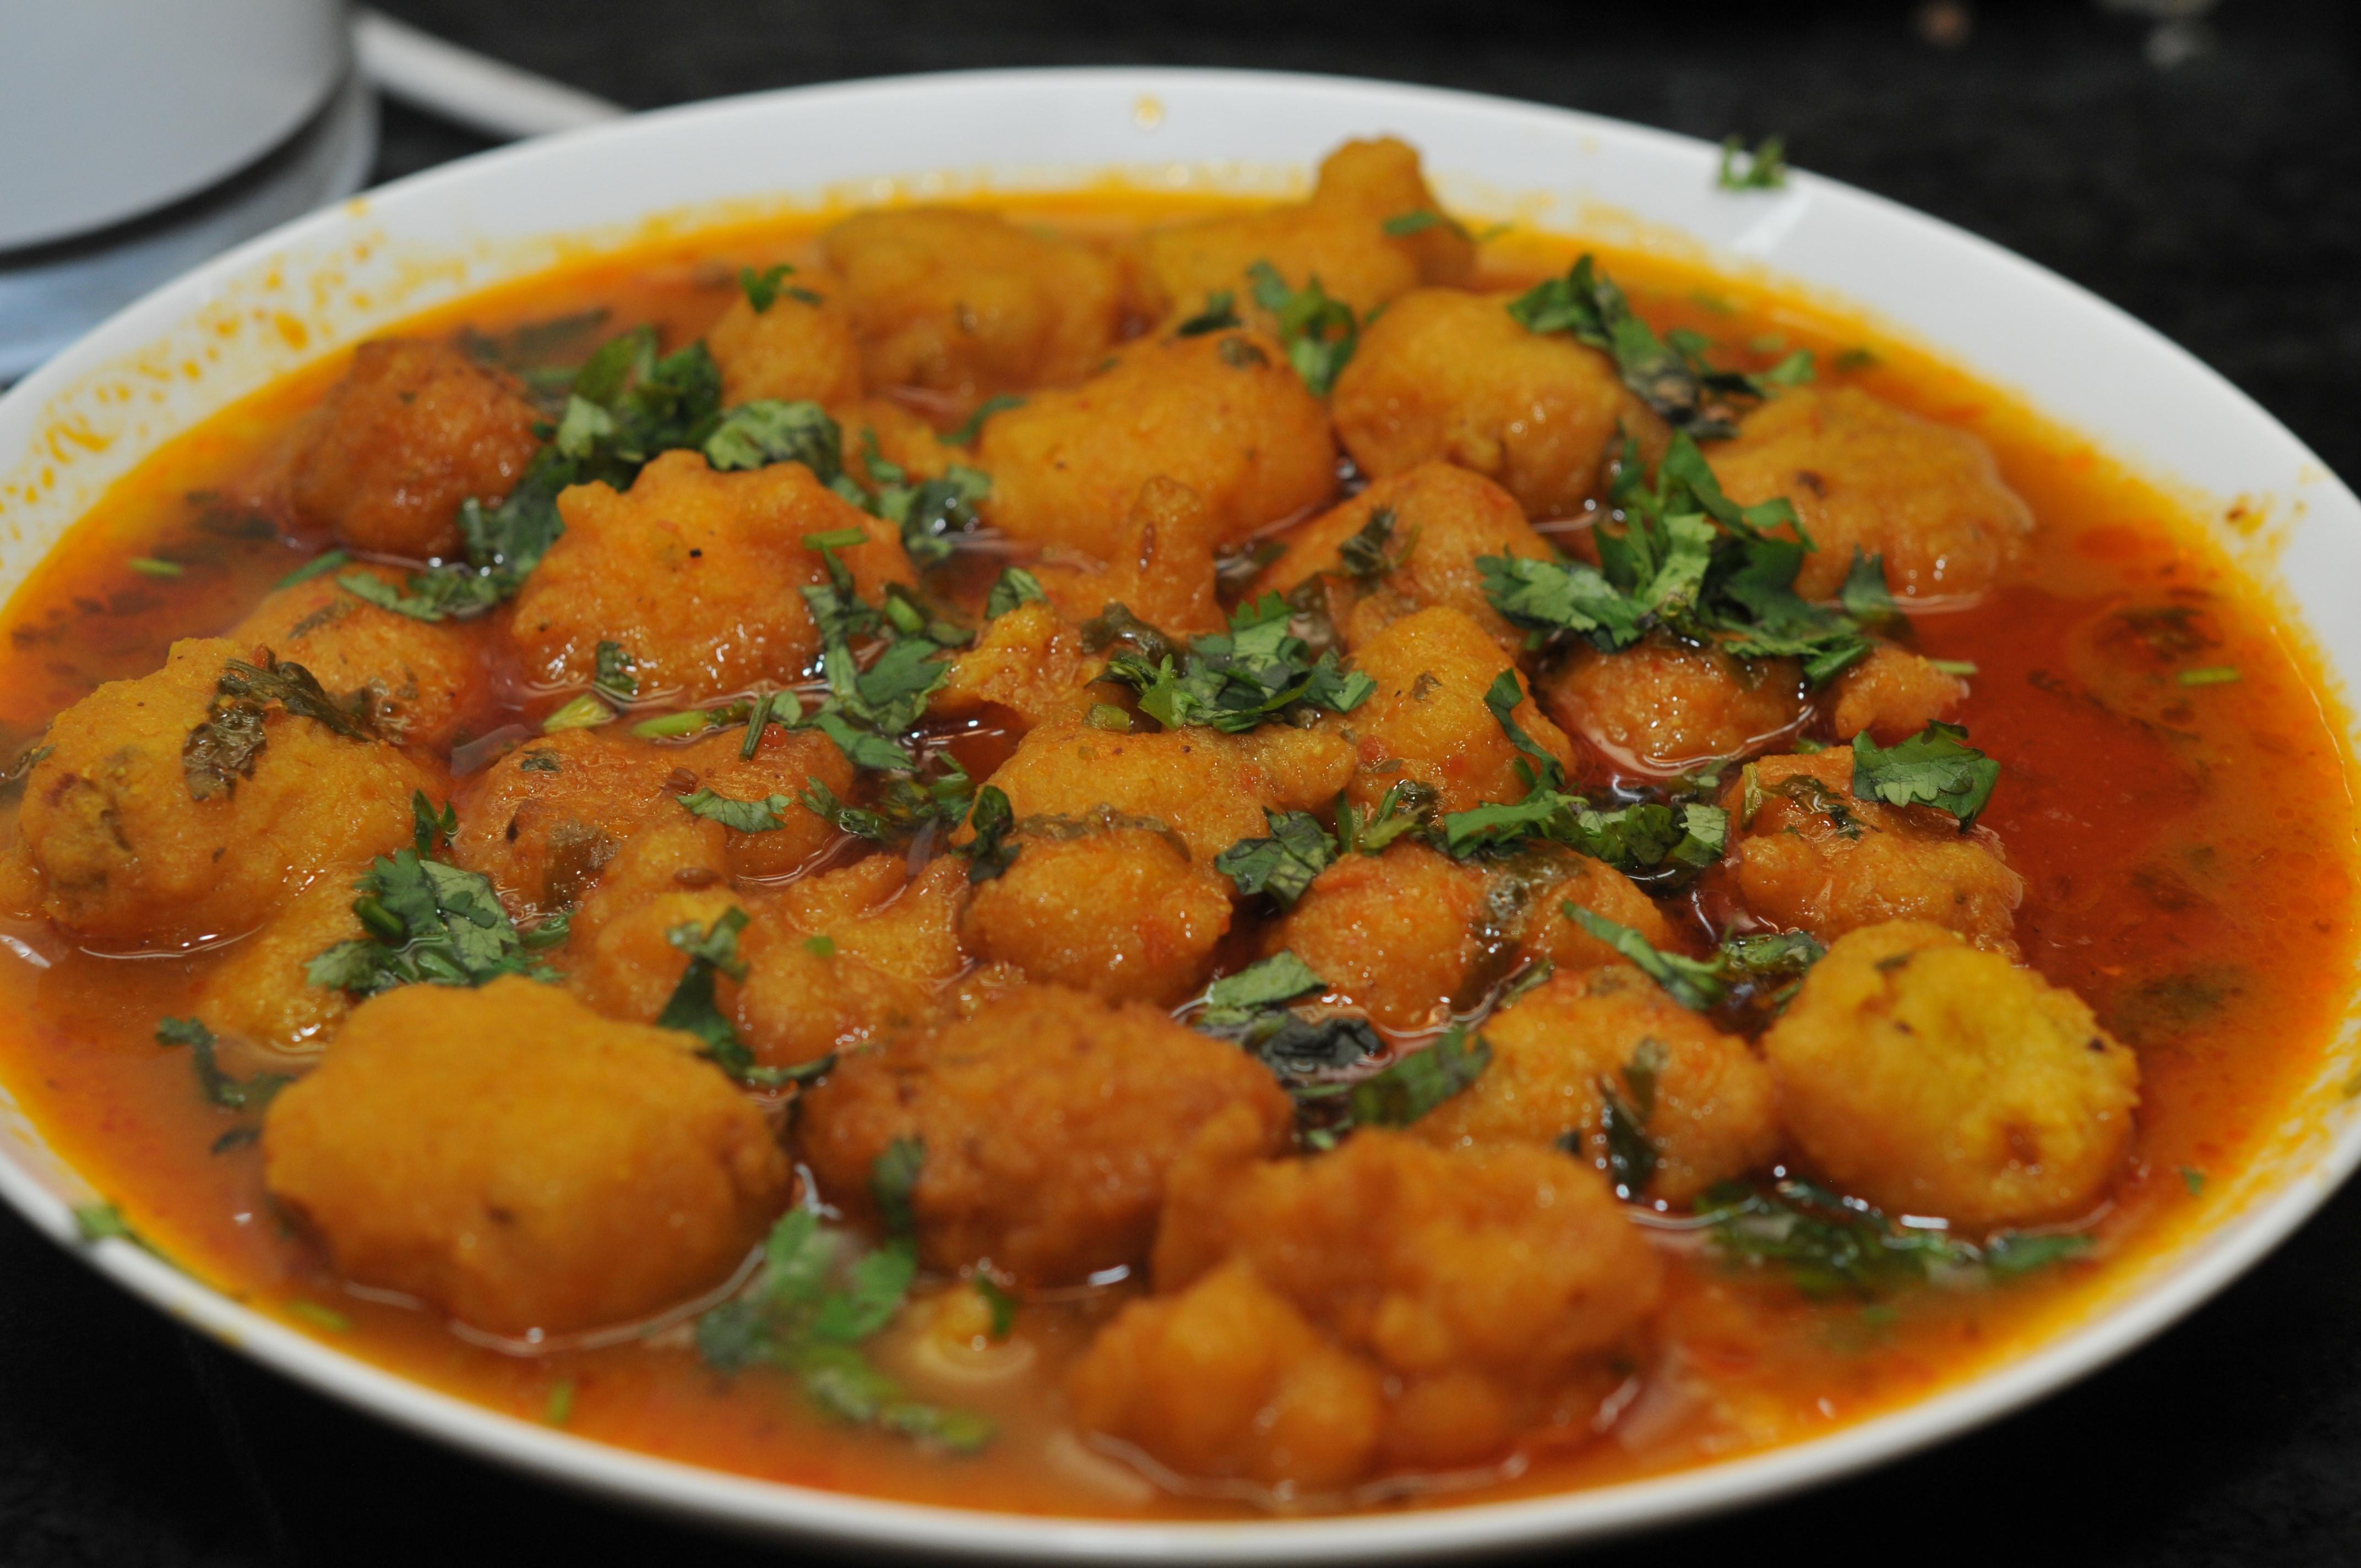 Indian Vegetarian Dinner Recipes  indian ve arian dinner recipes sanjeev kapoor Bali